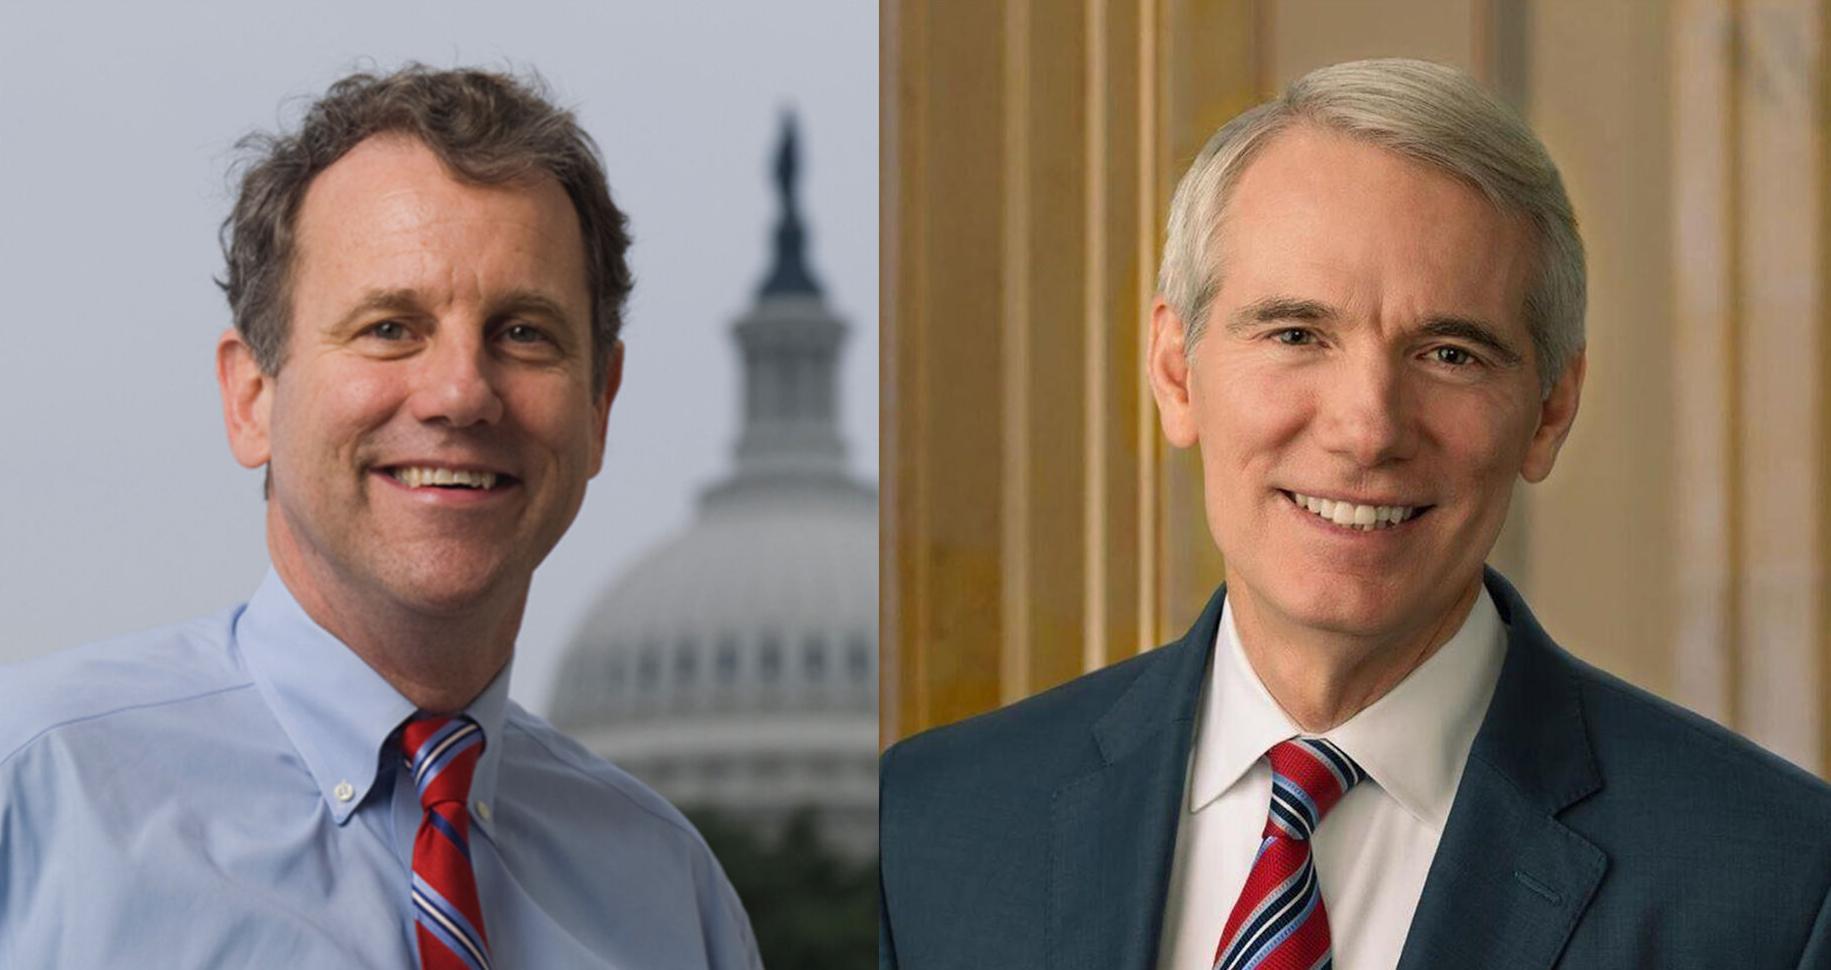 Ohio's U.S. senators condemn Capitol attack